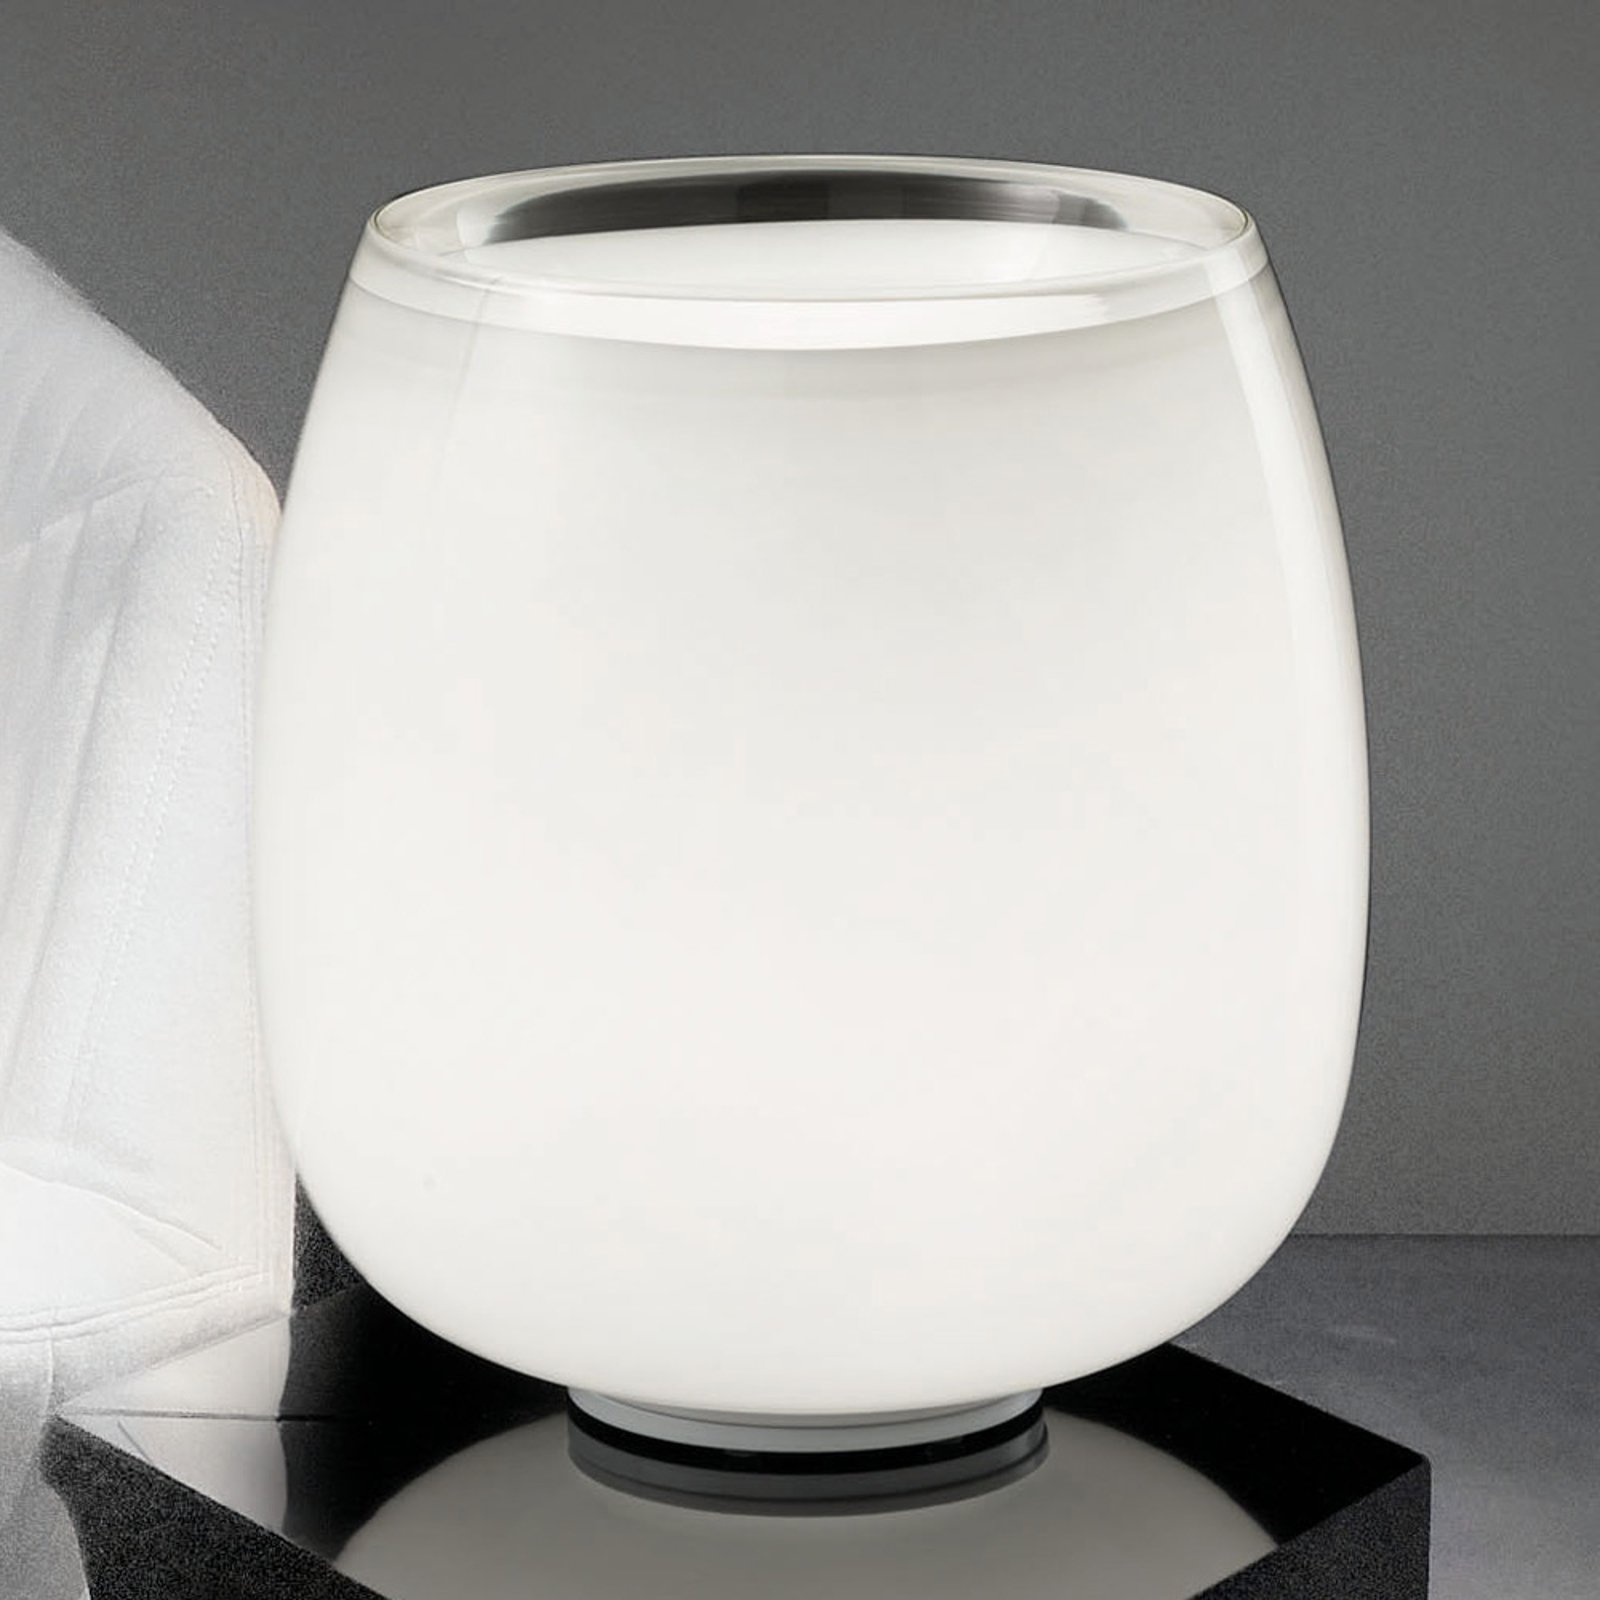 Implode - glass-bordlampe Ø 38 cm